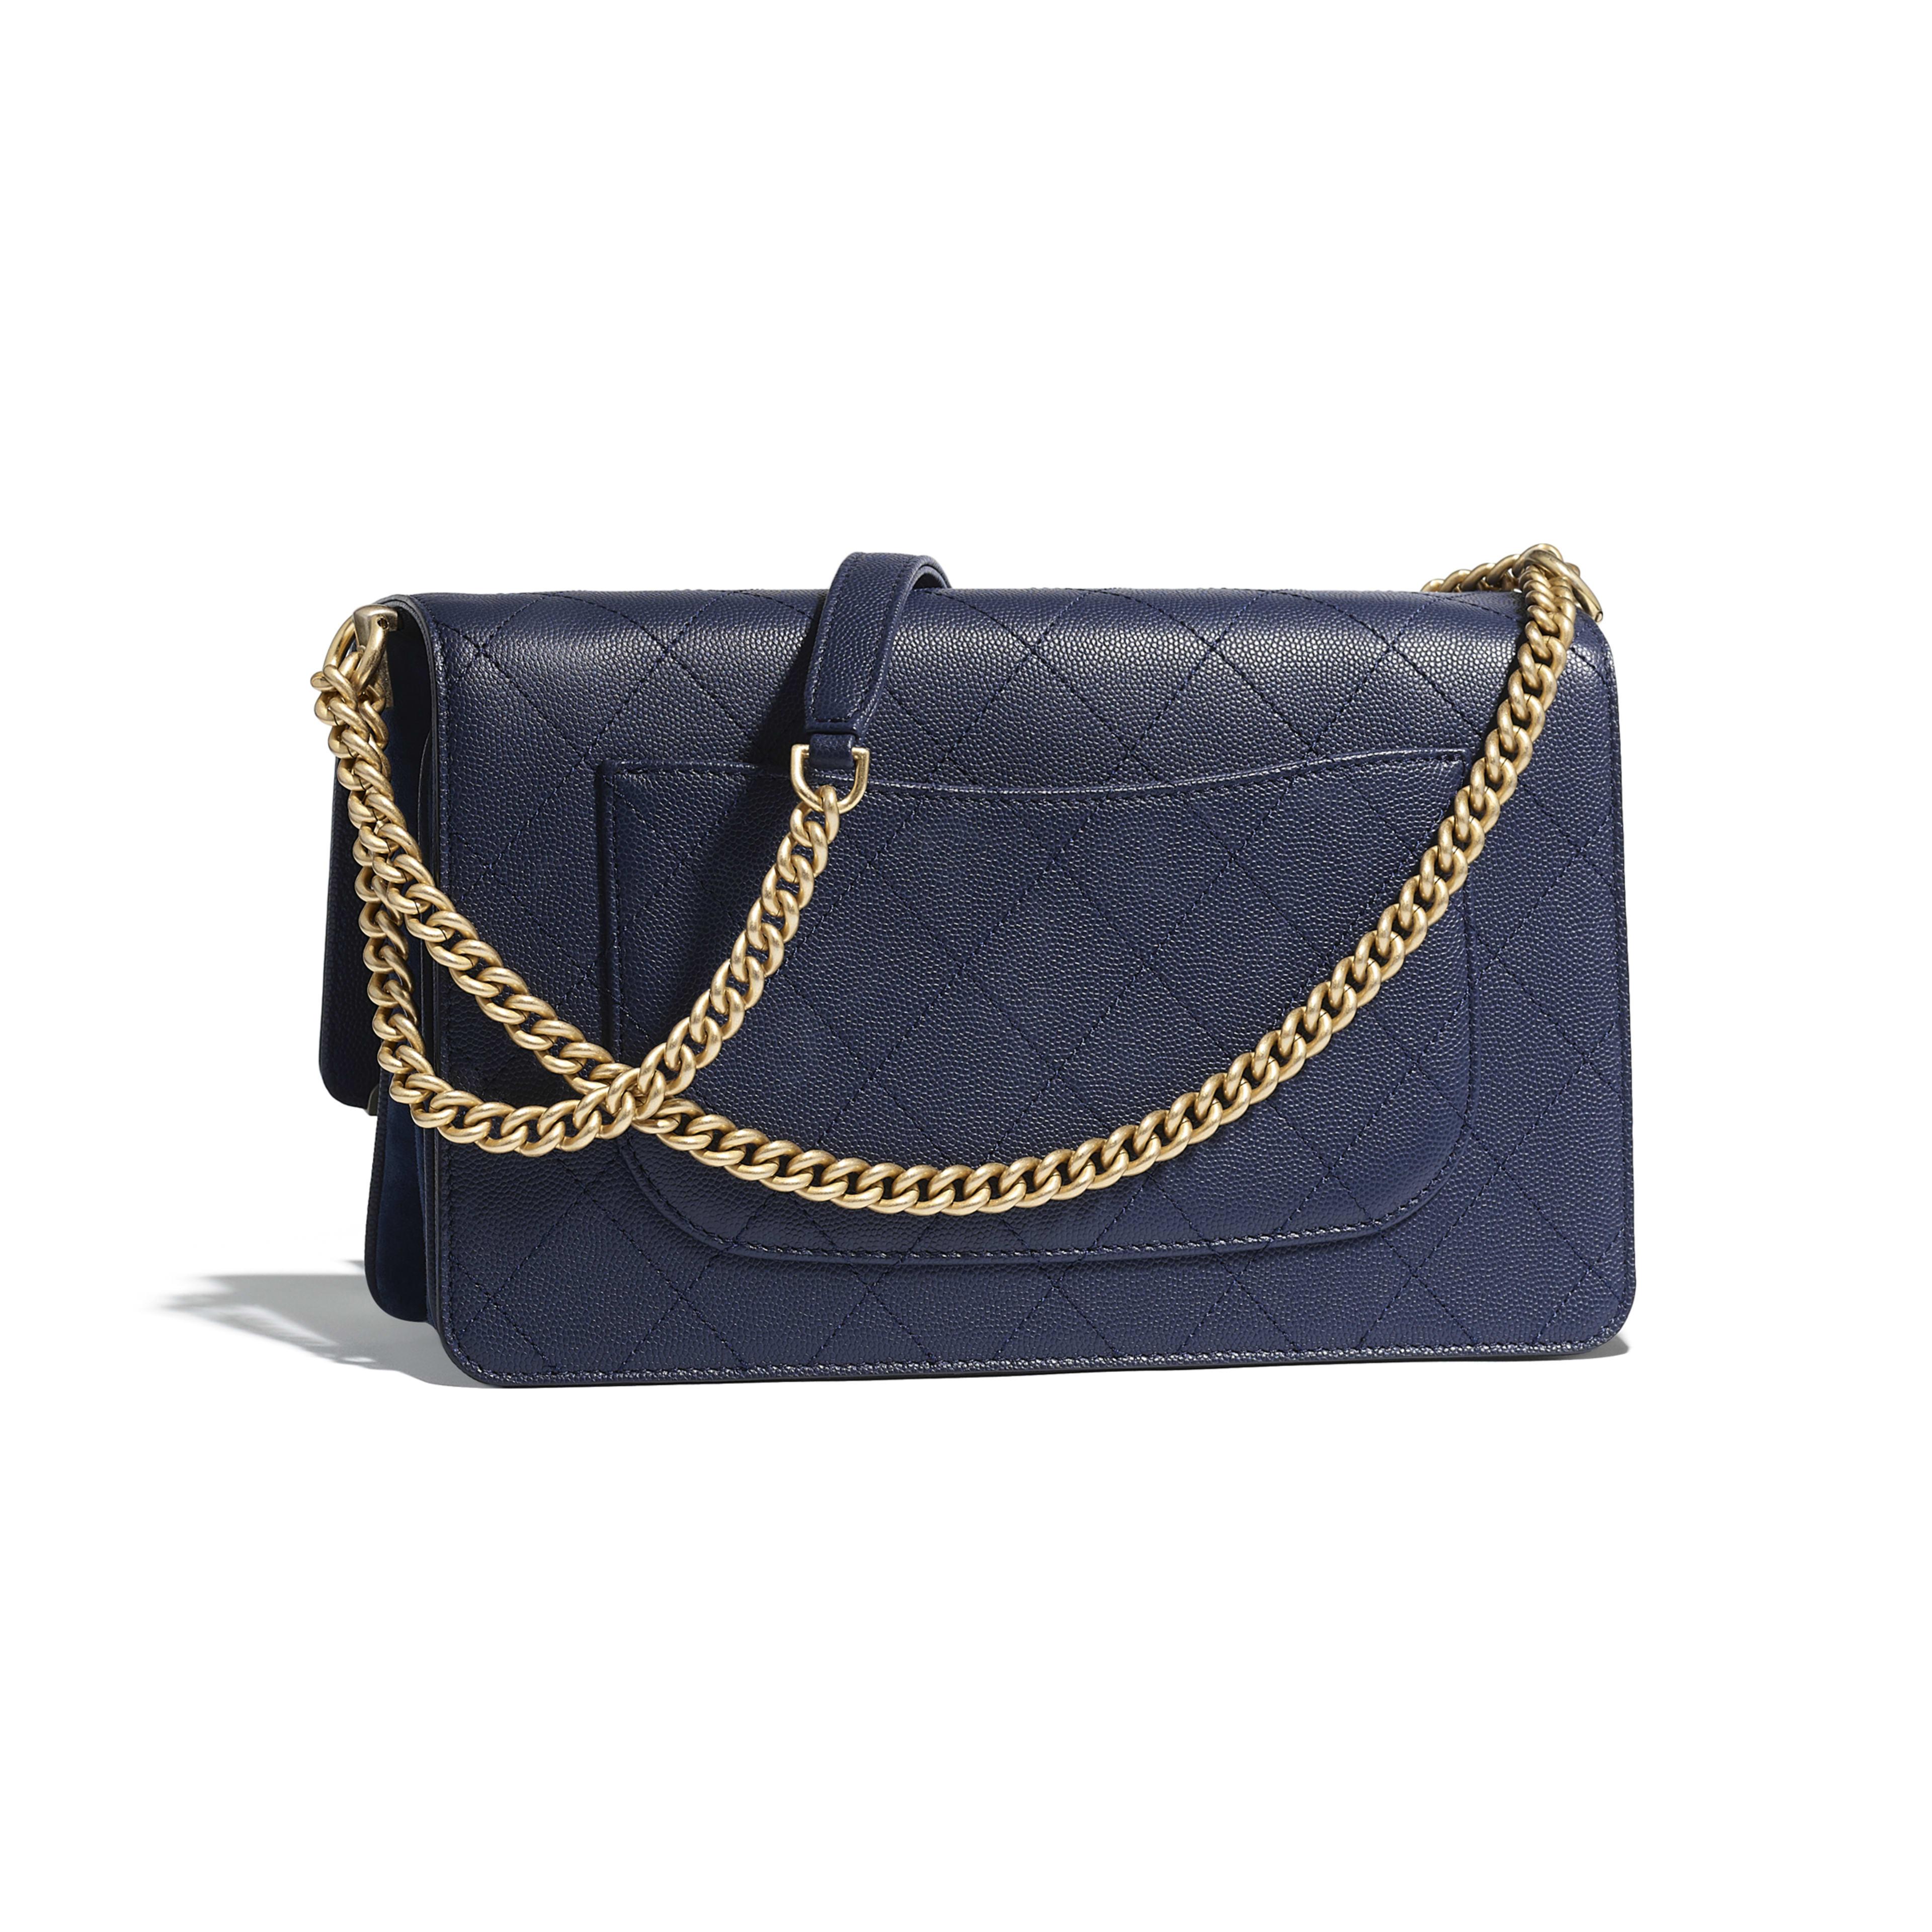 Flap Bag Navy Blue Grained Calfskin Suede Gold Tone Metal